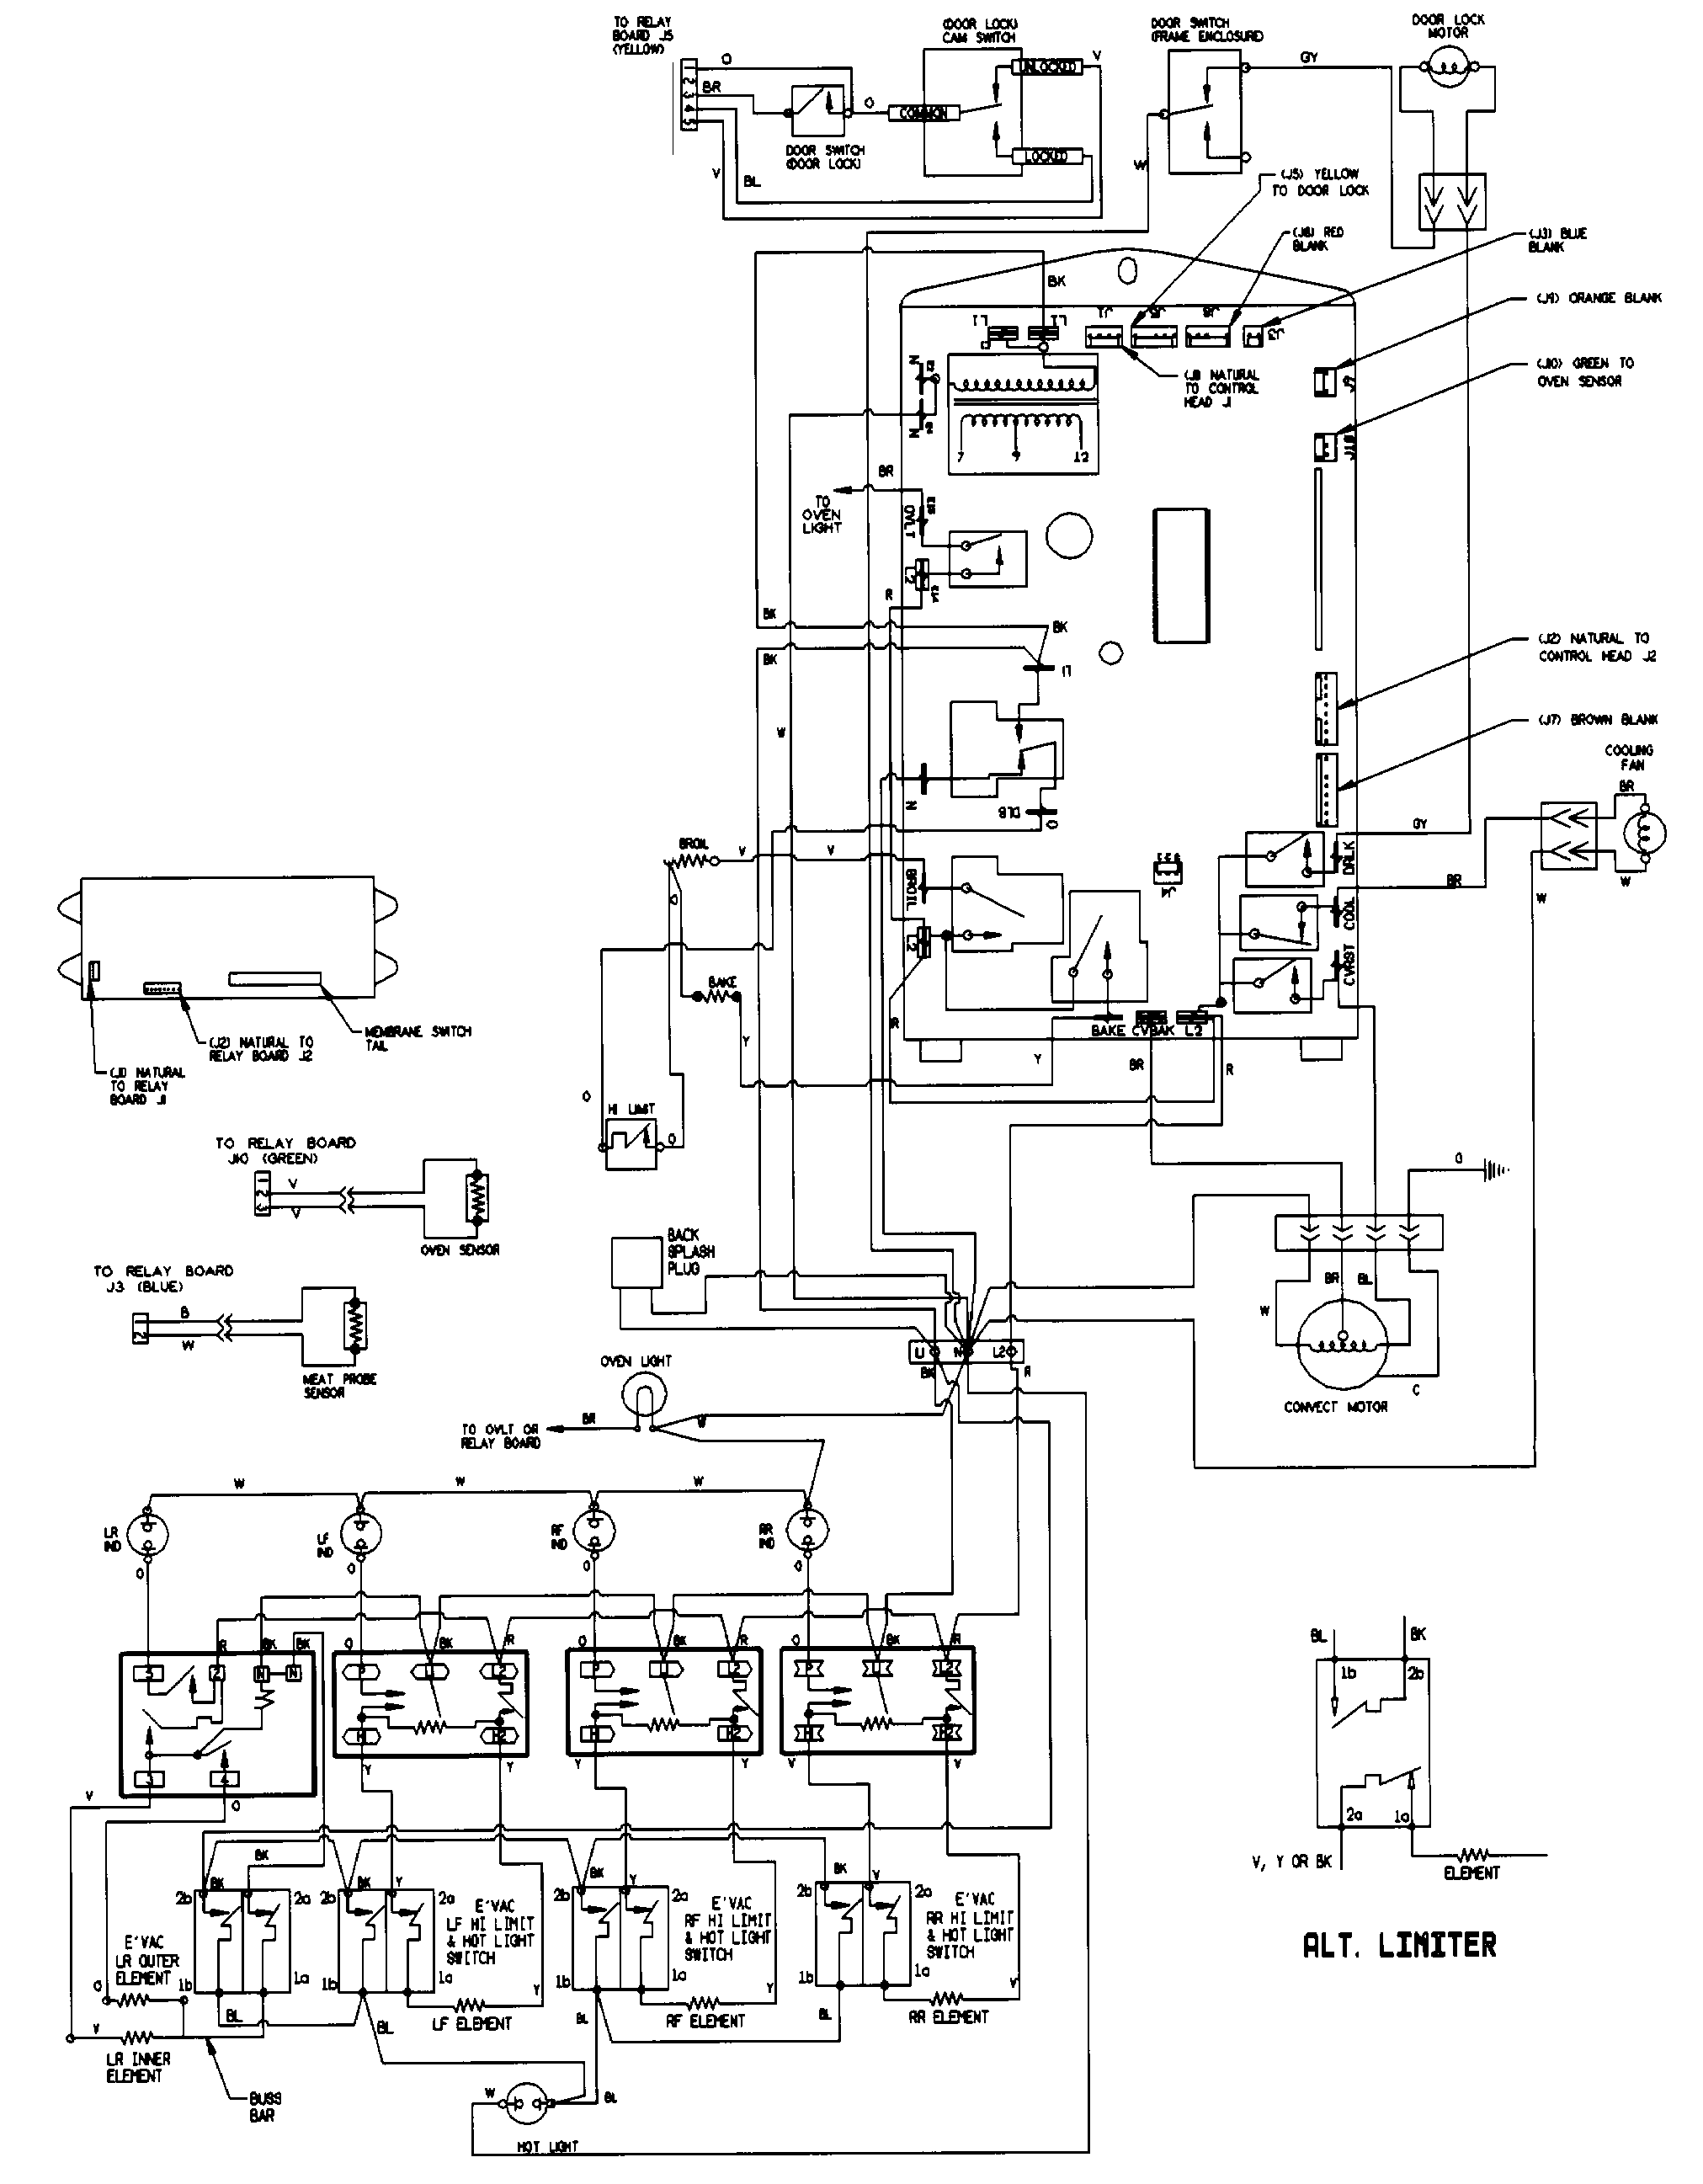 electrical wiring diagram refrigeration fd 8429  refrigerator parts diagram moreover refrigerator pressor  refrigerator parts diagram moreover